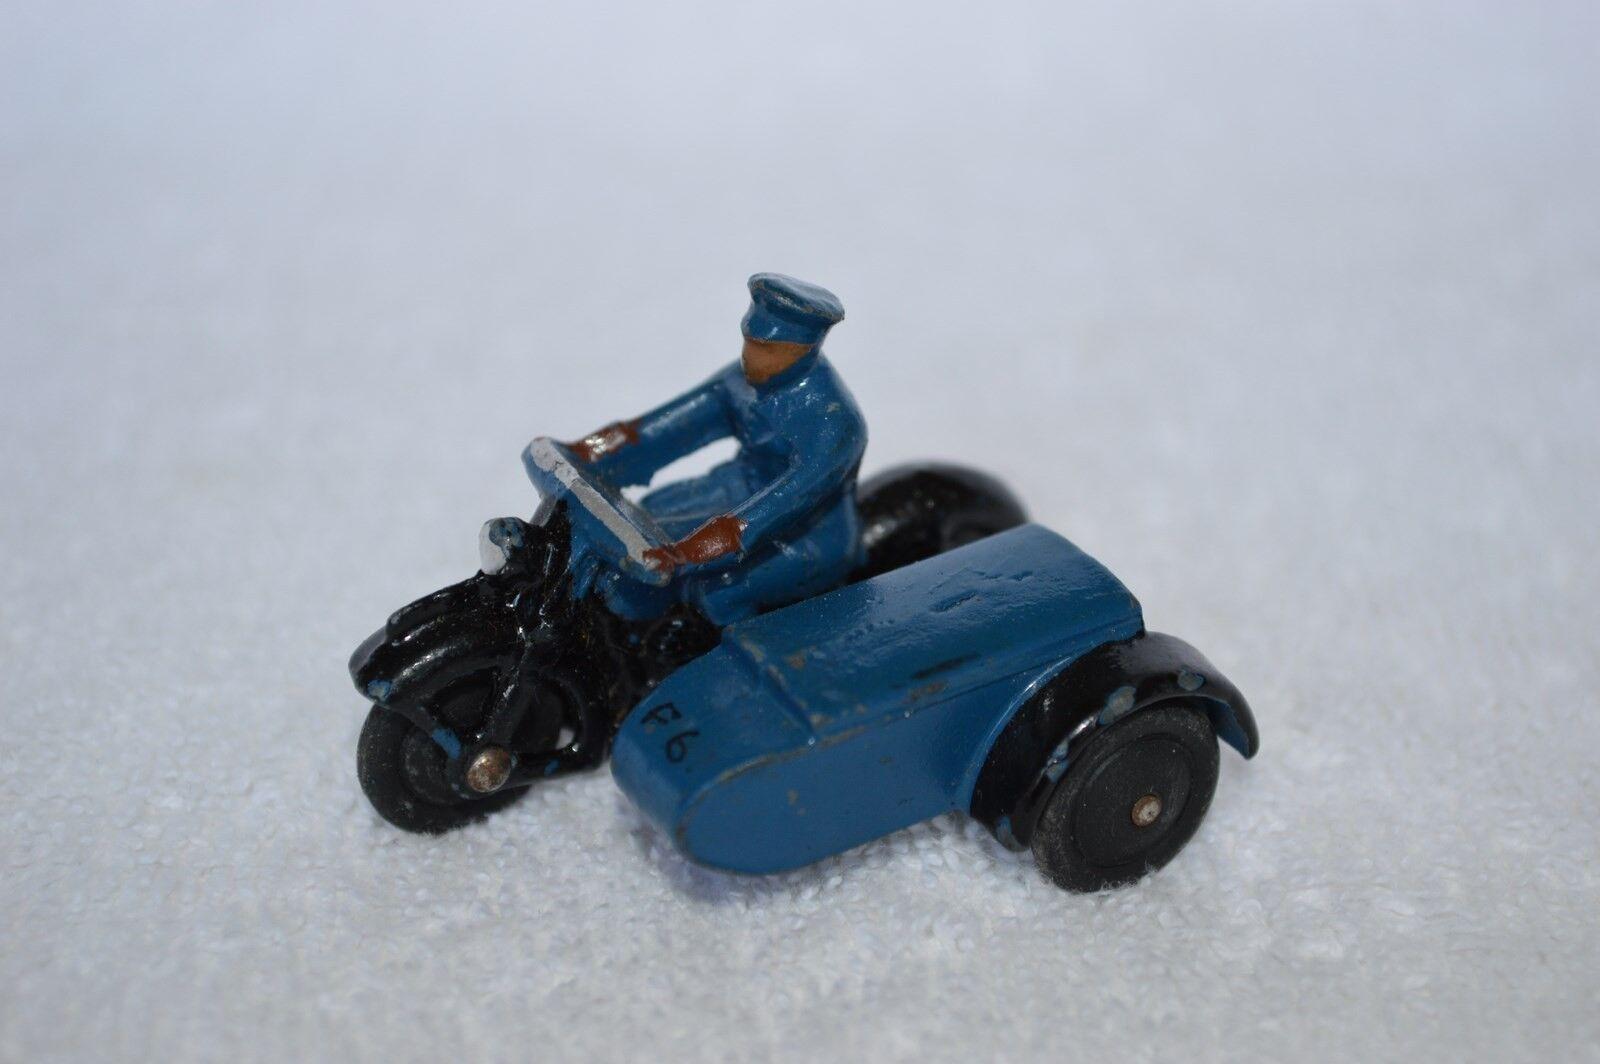 DINKY TOYS 43 B 43B MOTOR WITH SIDECAR RAC RAC RAC blueE NEAR MINT RARE SELTEN RARO   0e3c42